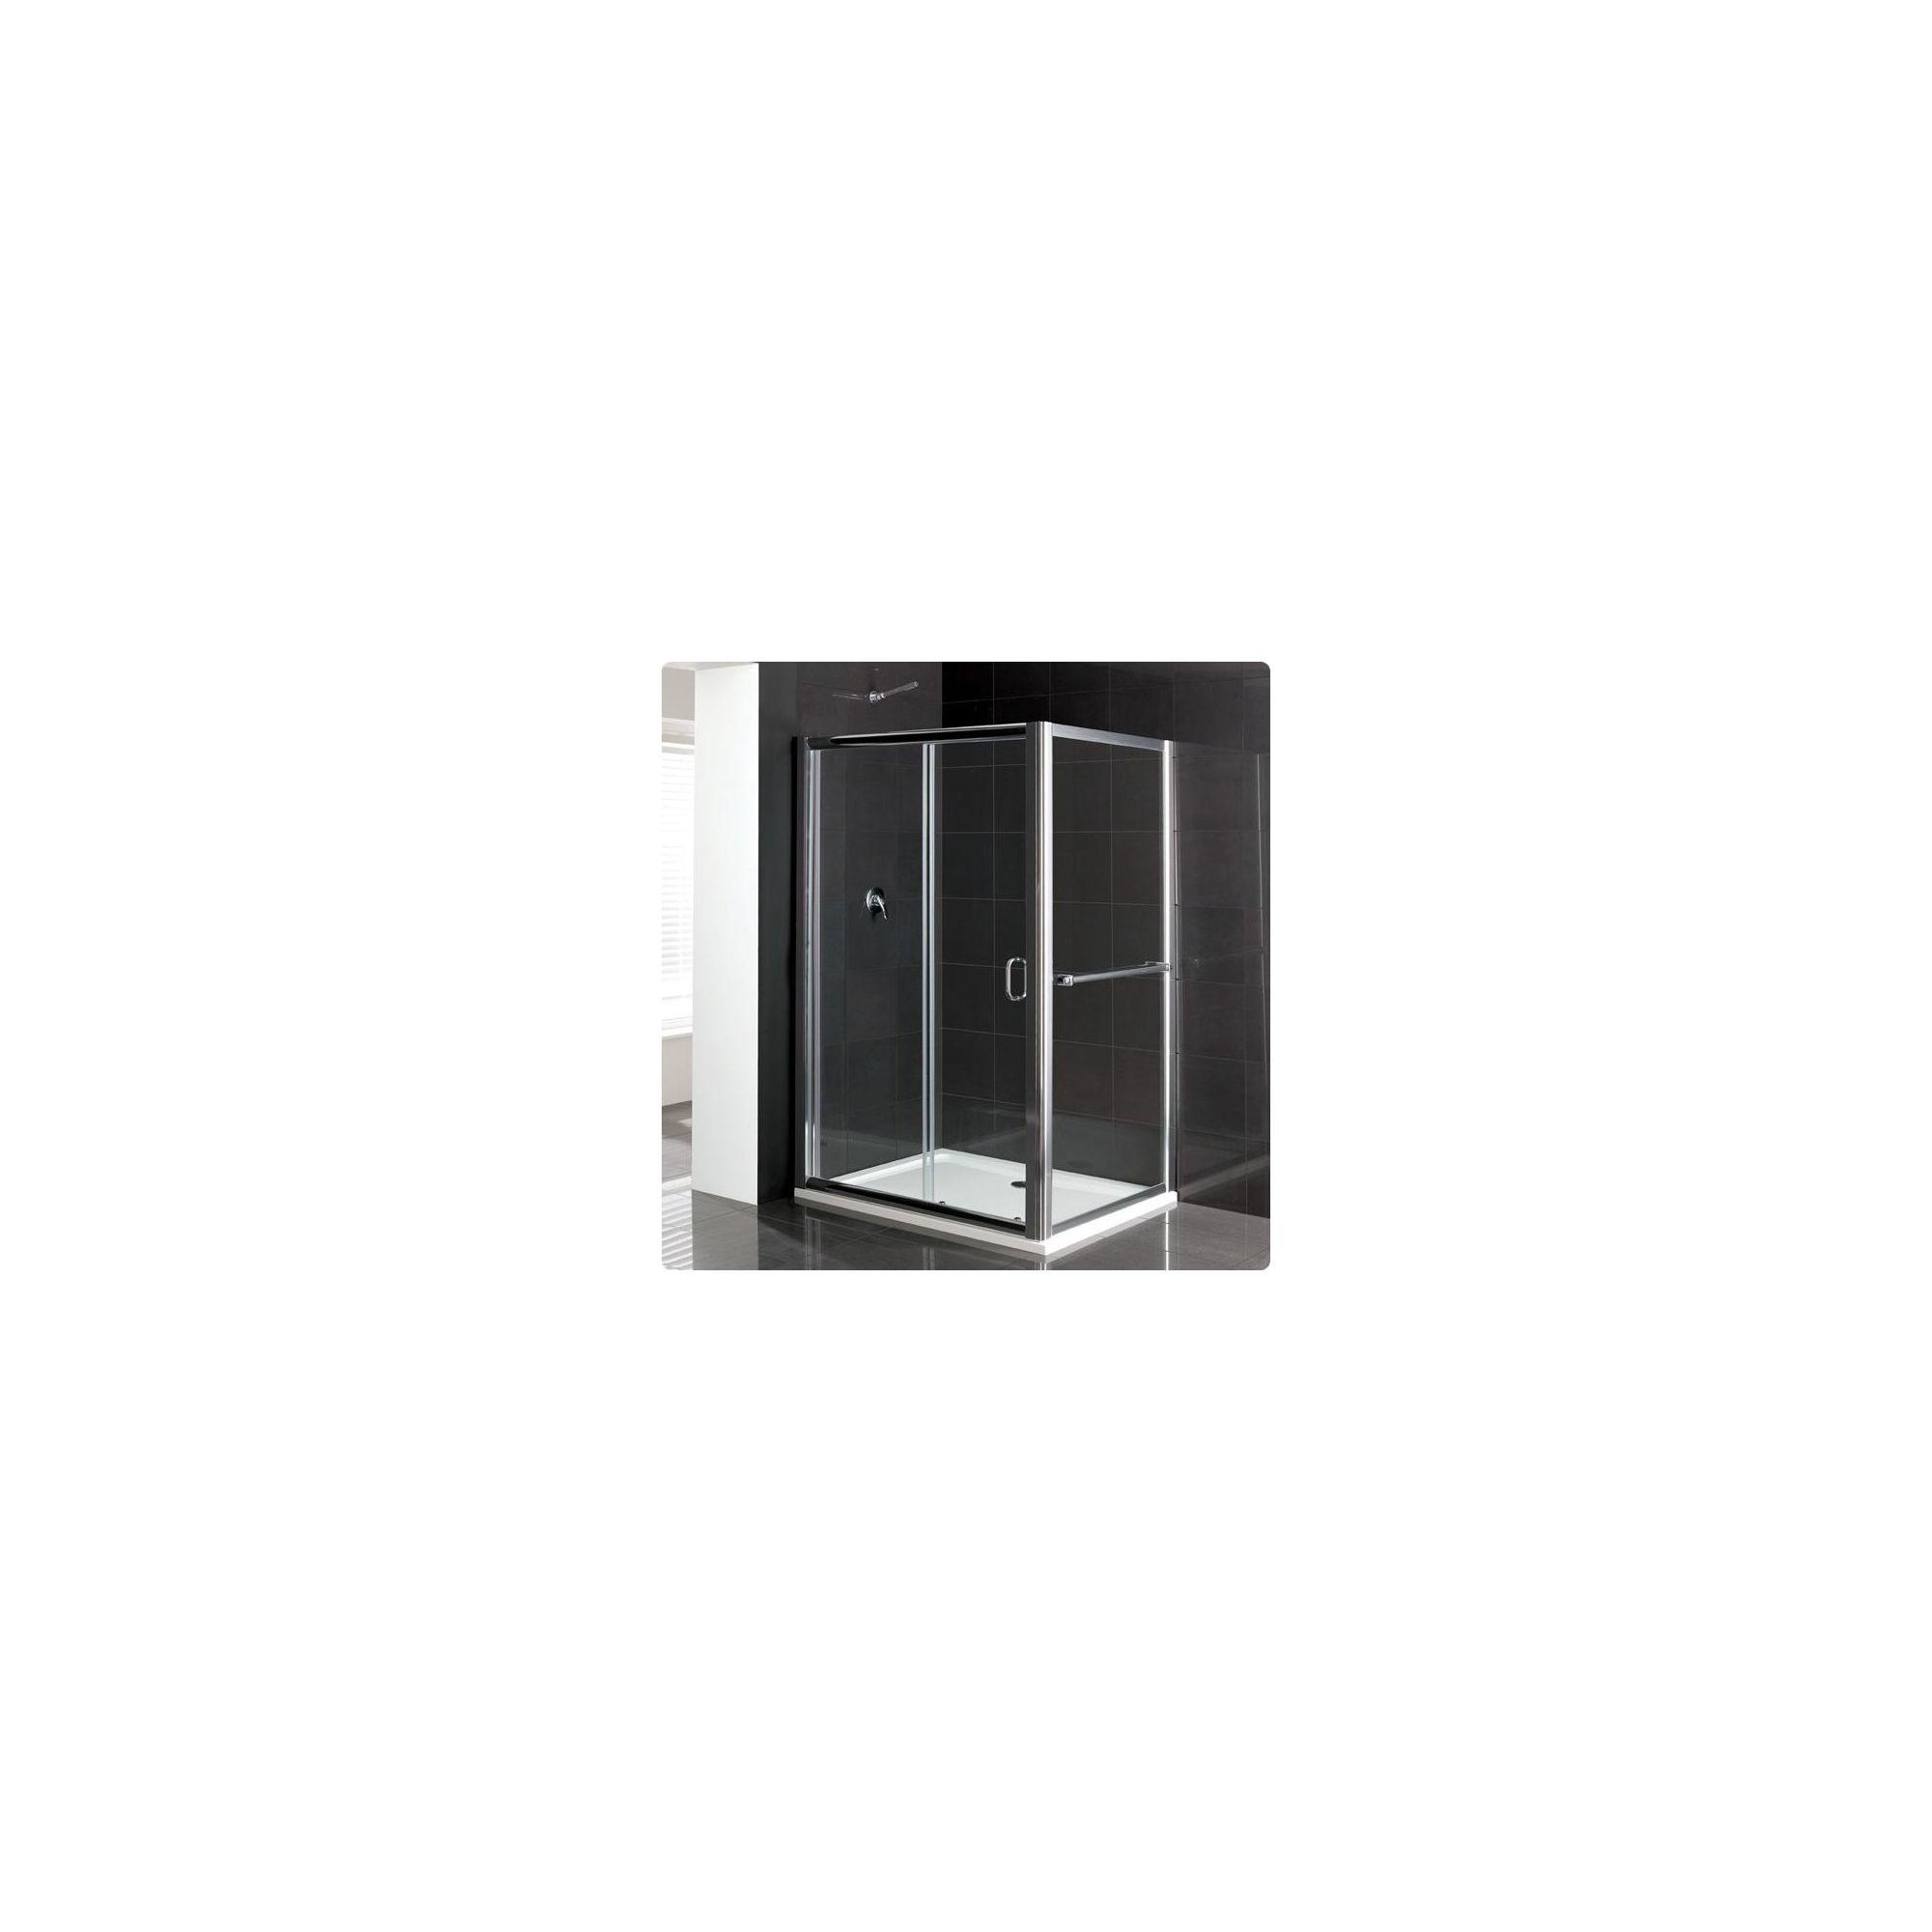 Duchy Elite Silver Sliding Door Shower Enclosure, 1400mm x 760mm, Standard Tray, 6mm Glass at Tesco Direct